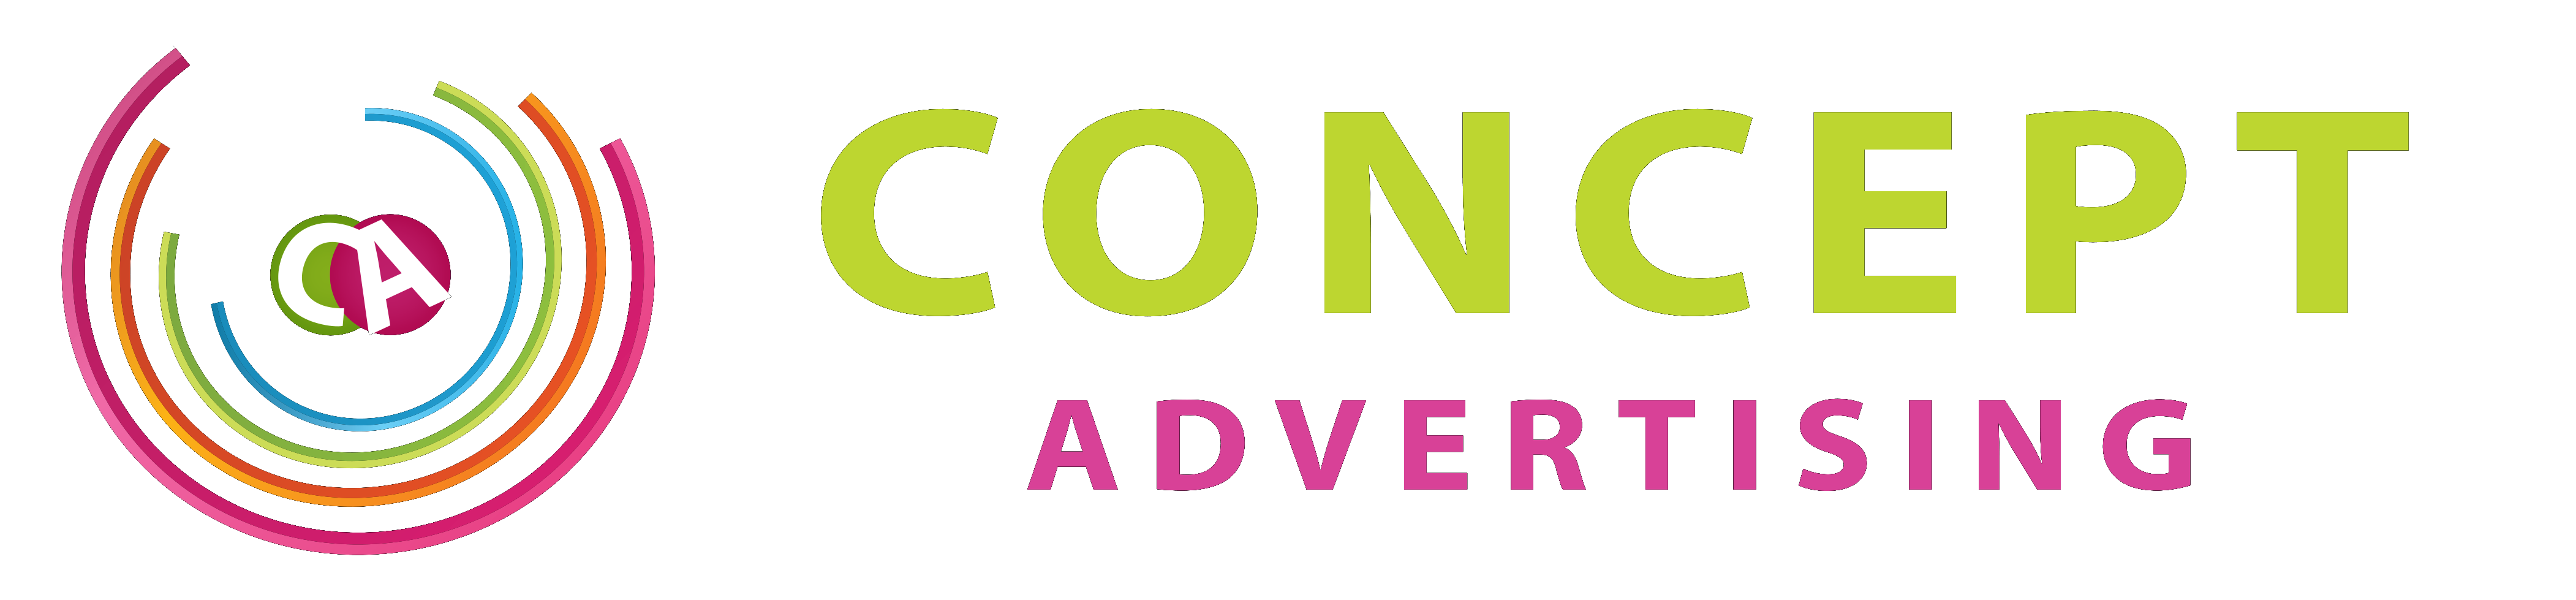 Drukarnia etykiet Concept Advertising